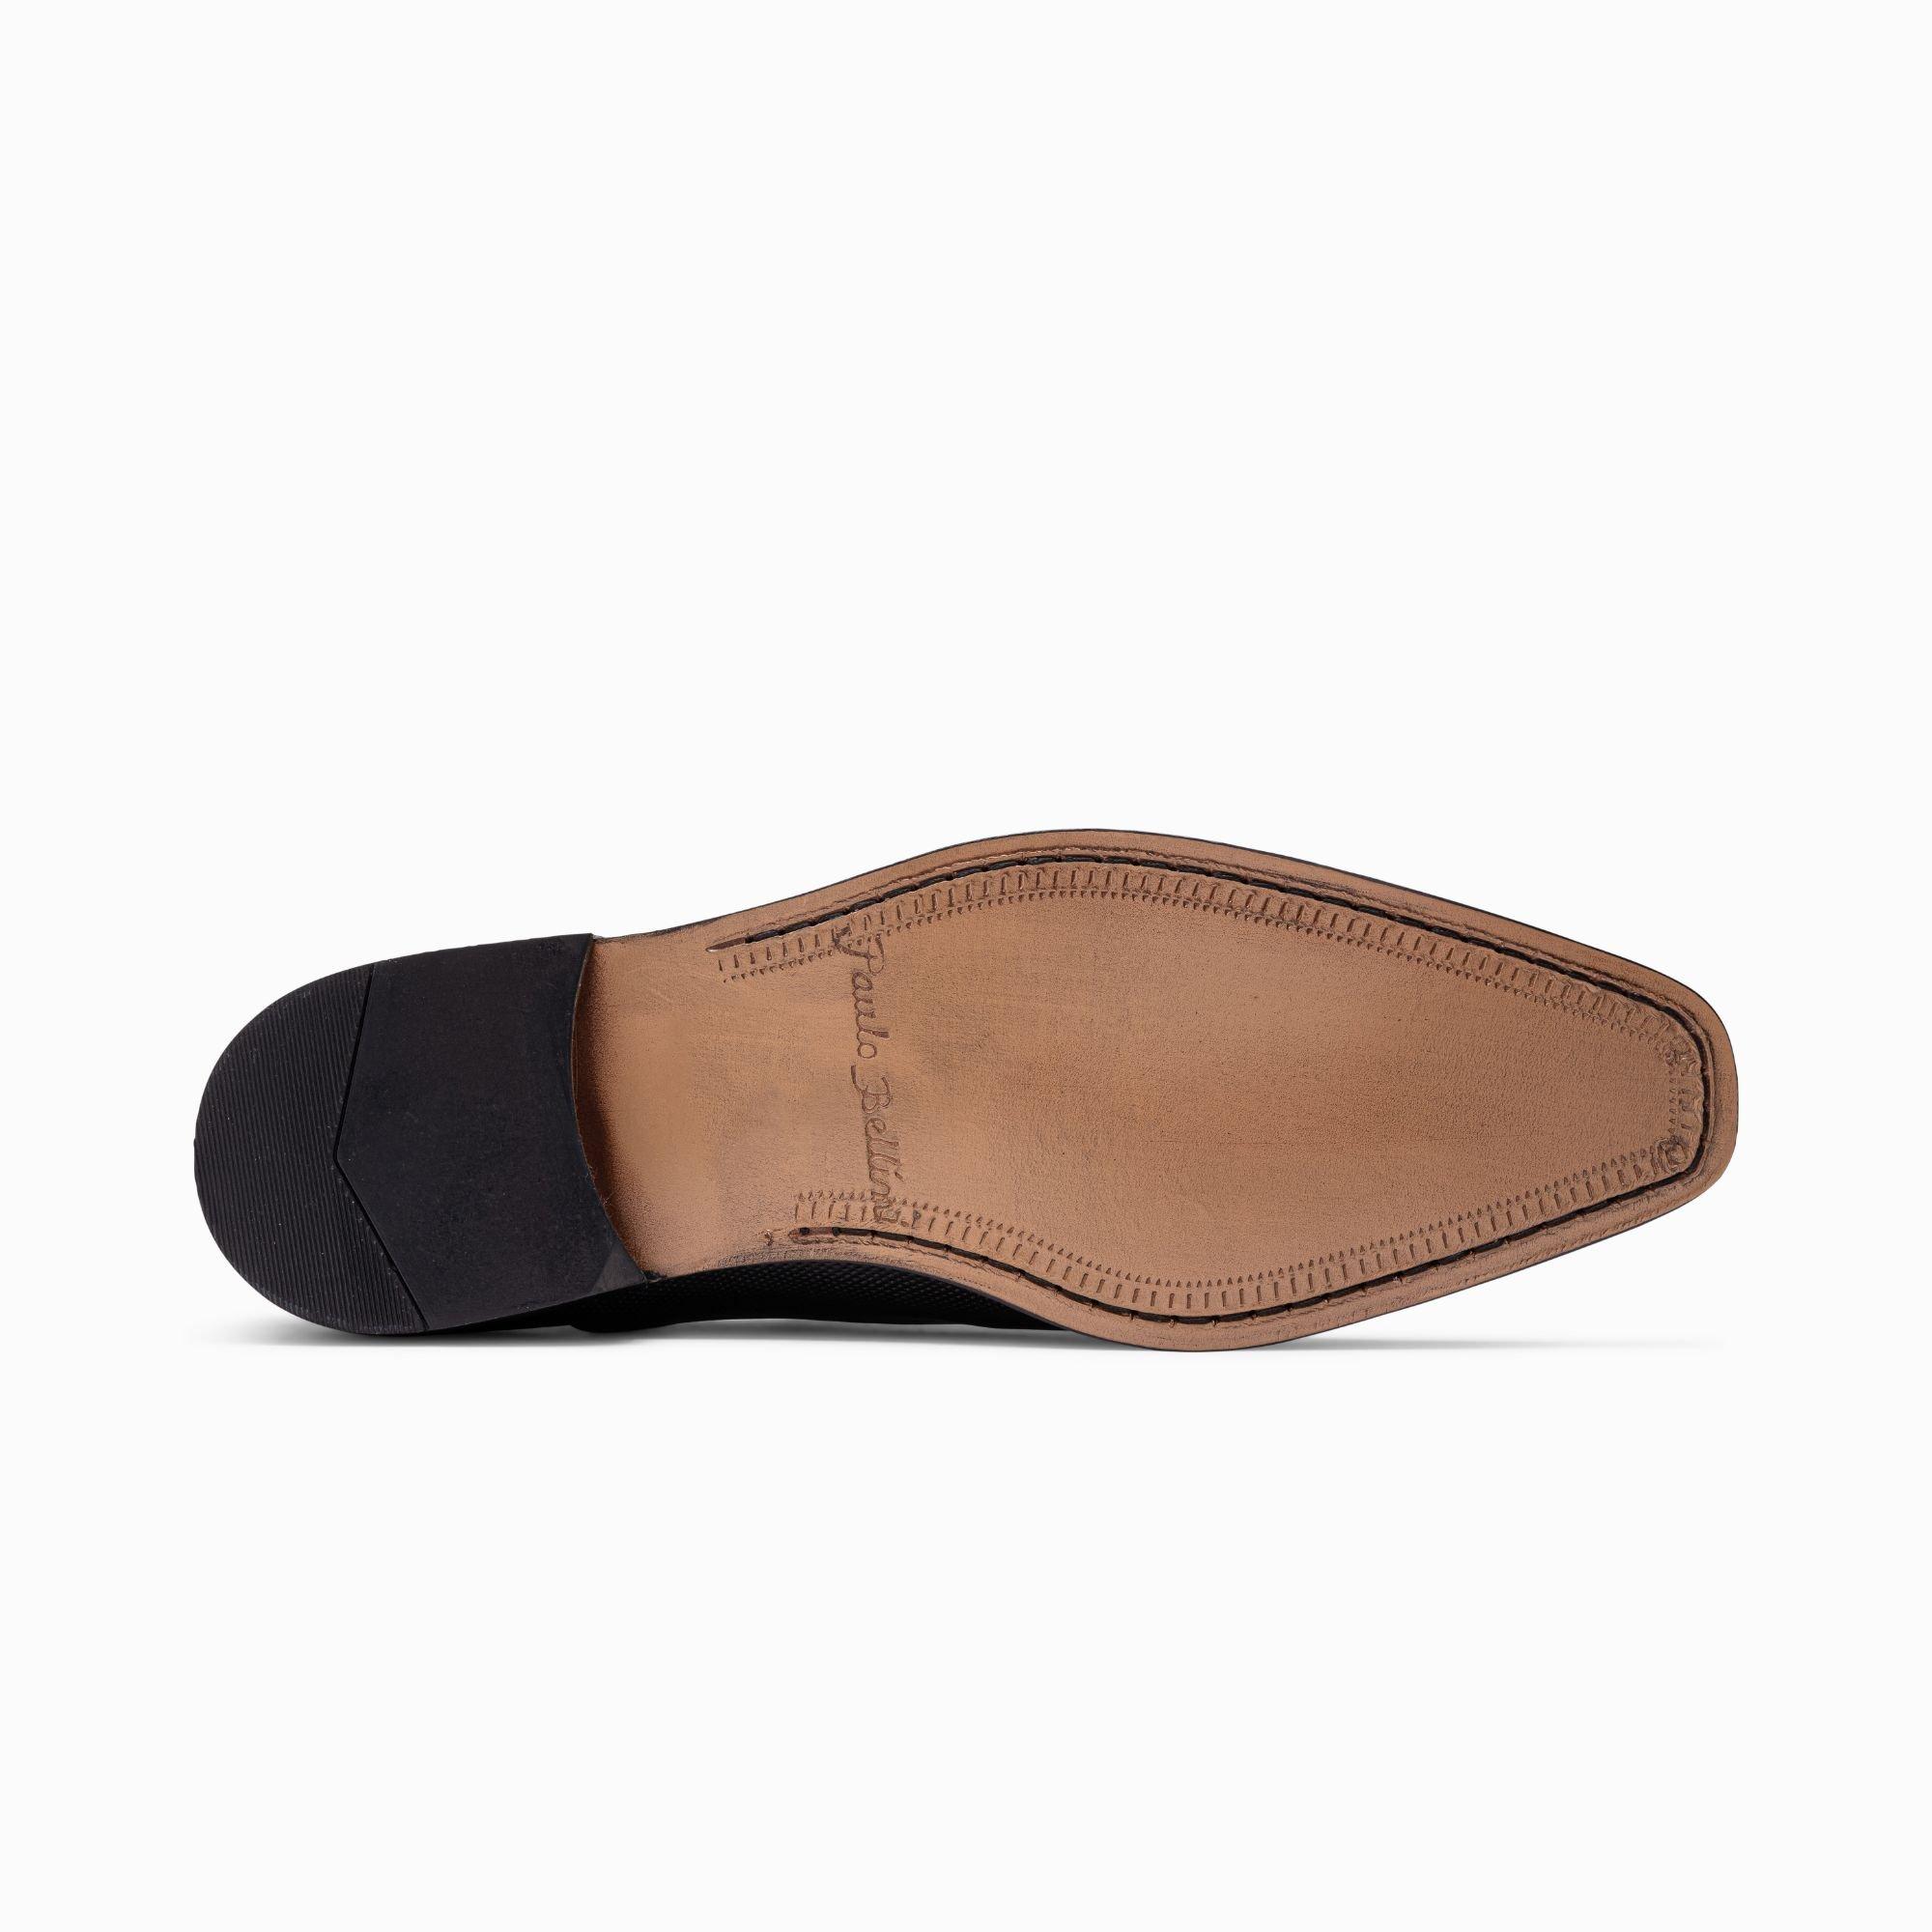 1301b-black-mat-leather_04